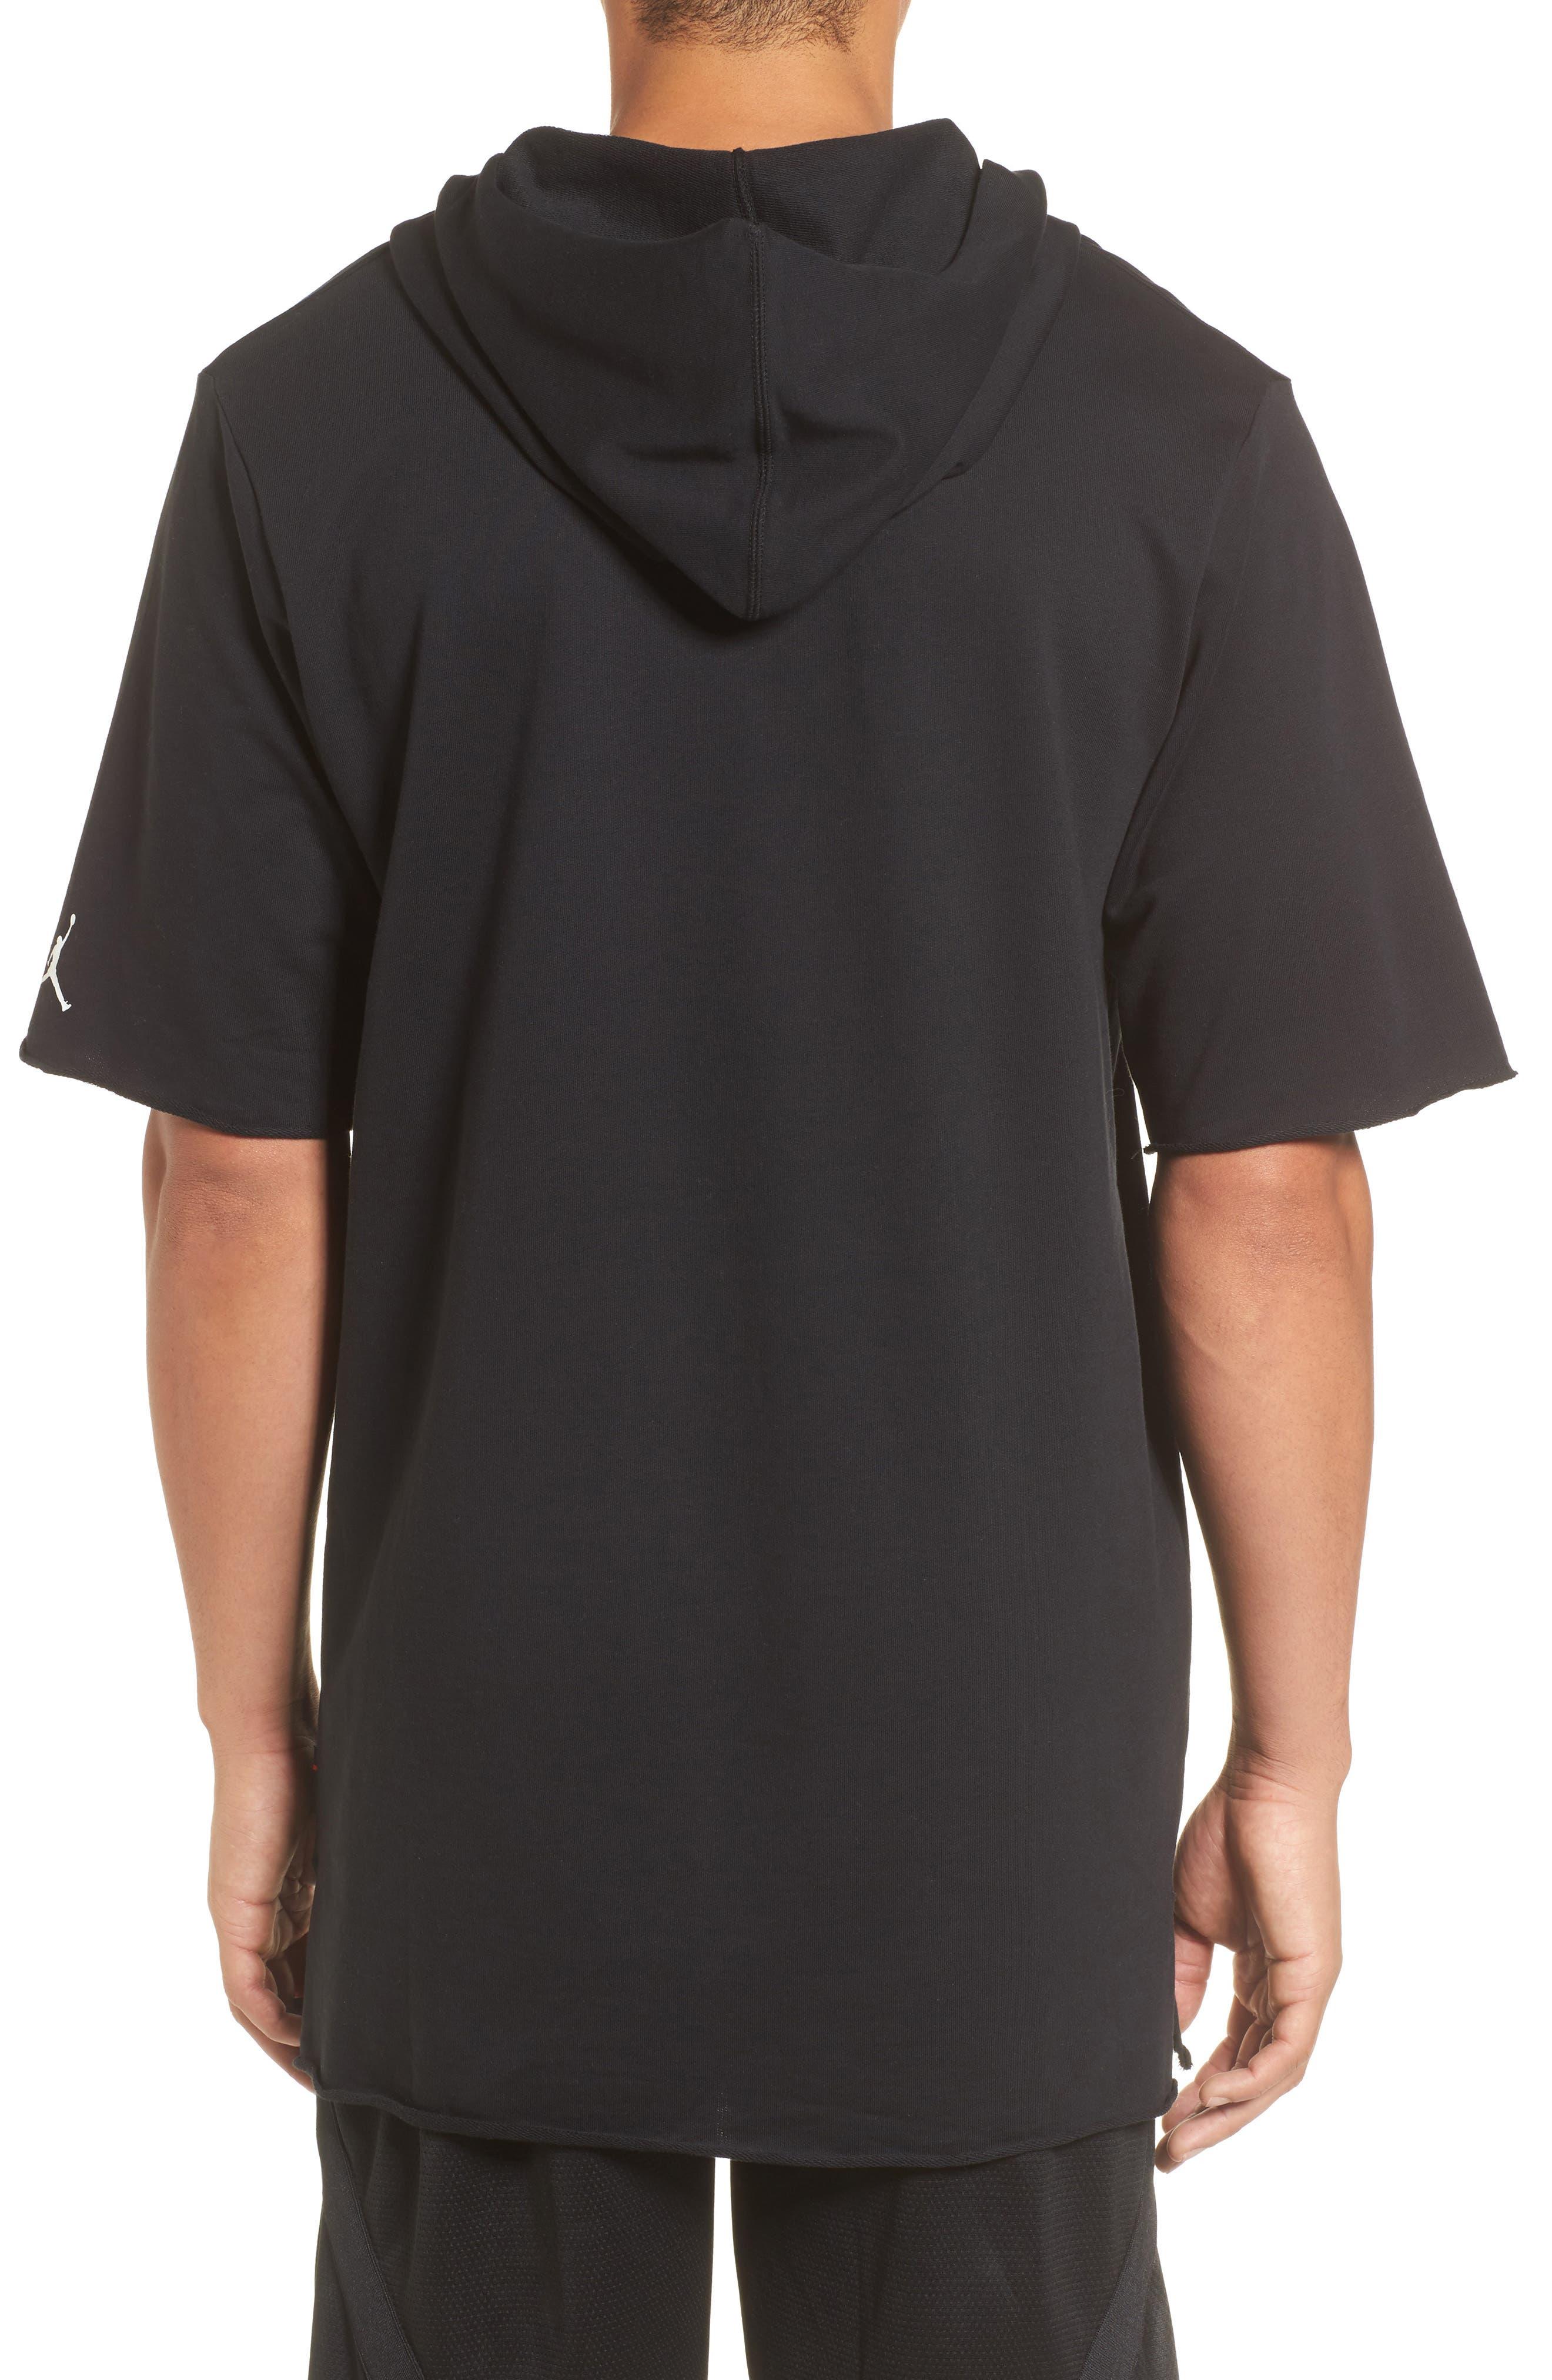 Sportswear City of Flight Hooded T-Shirt,                             Alternate thumbnail 2, color,                             Black/ White